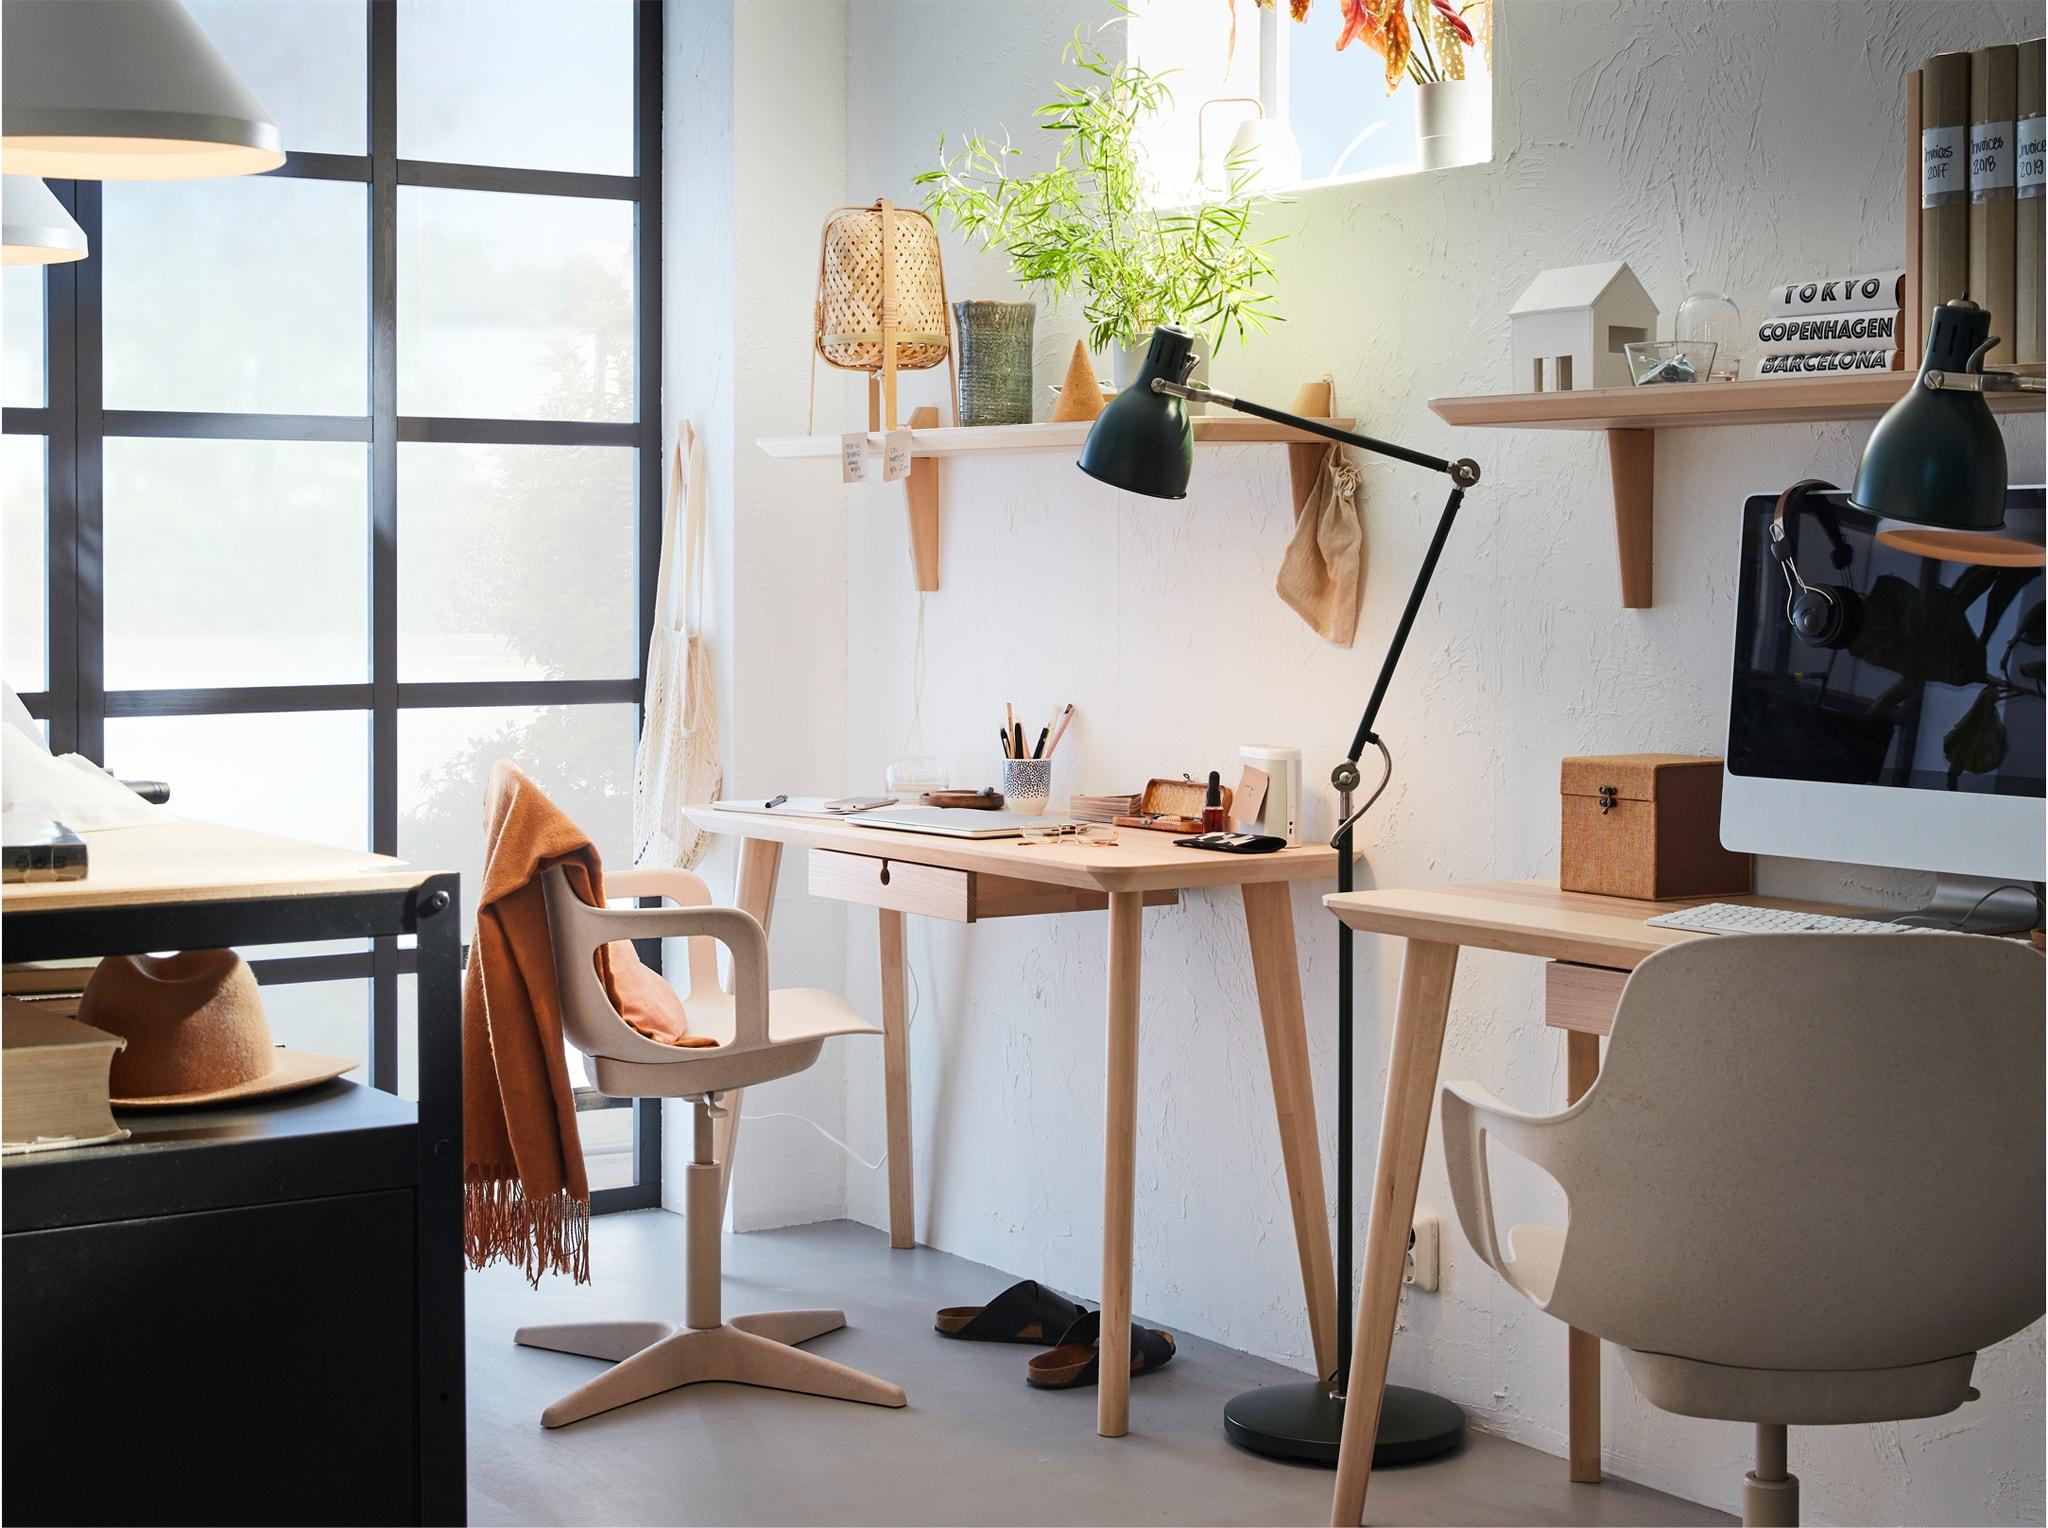 Two desks in ash veneer with white/beige swivel chairs, a black floor lamp between them and two wall shelves in ash veneer.